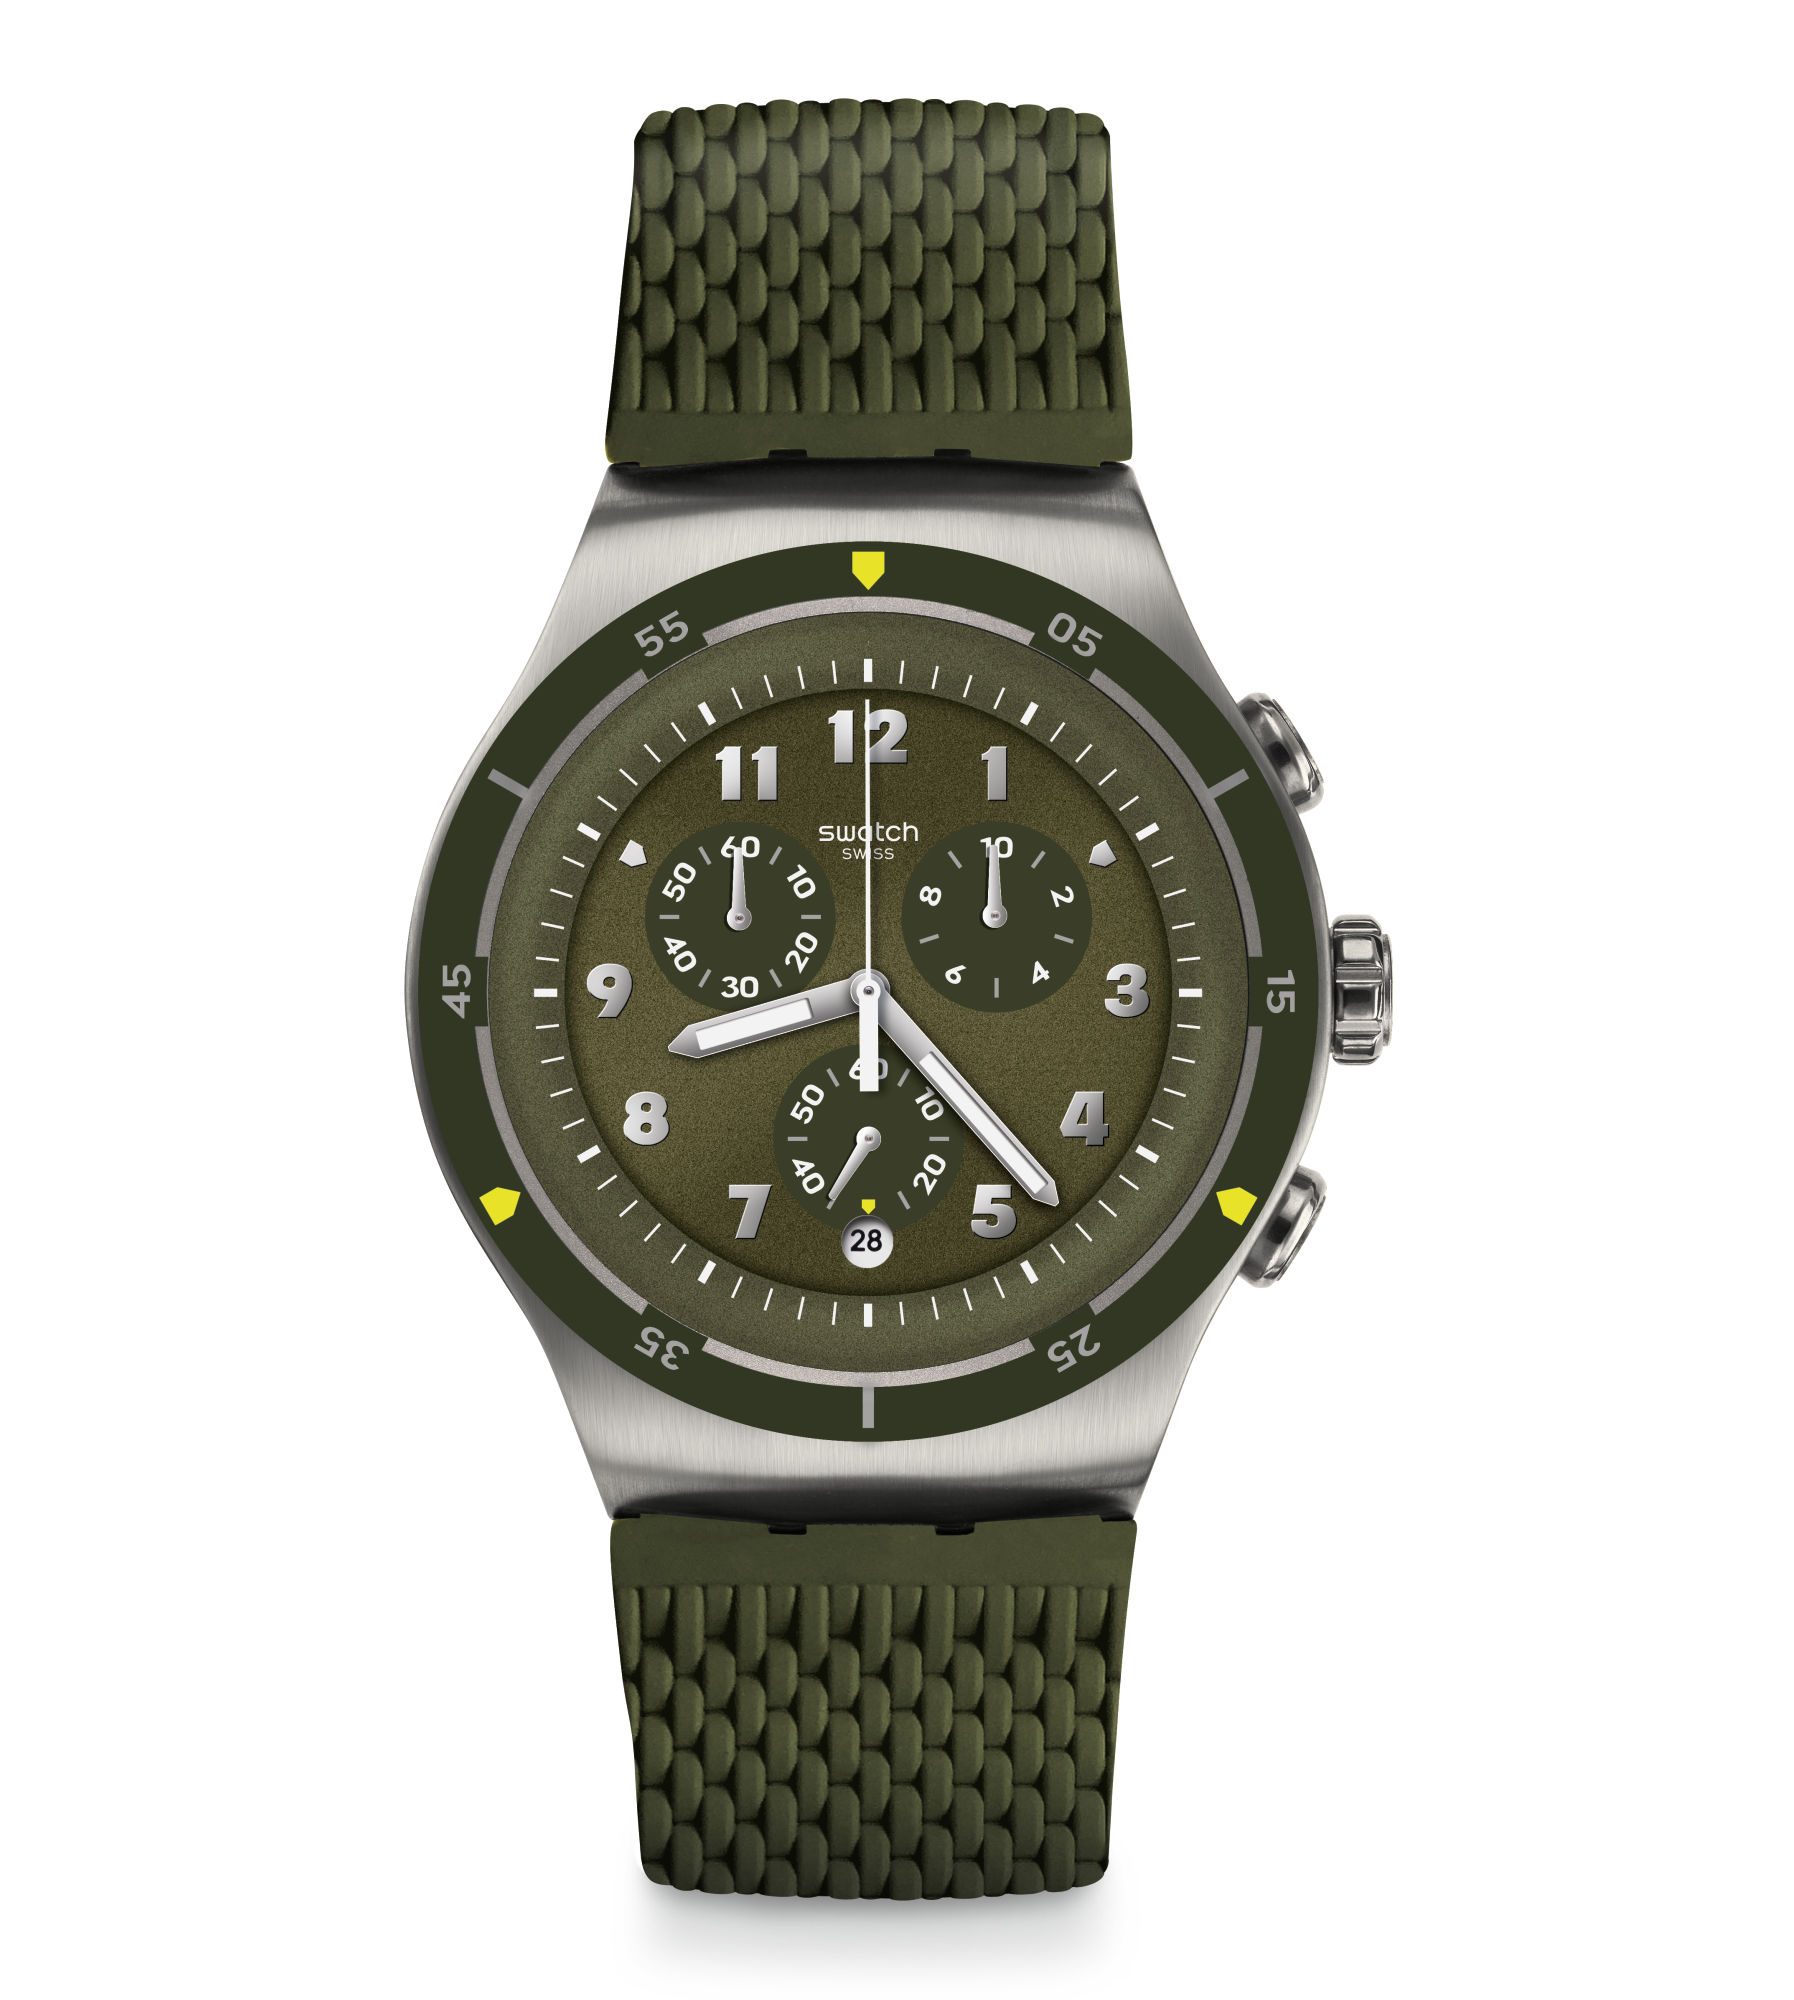 Swatch Reloj Verdes Agujas Reloj Irony Swatch Irony wOknP0